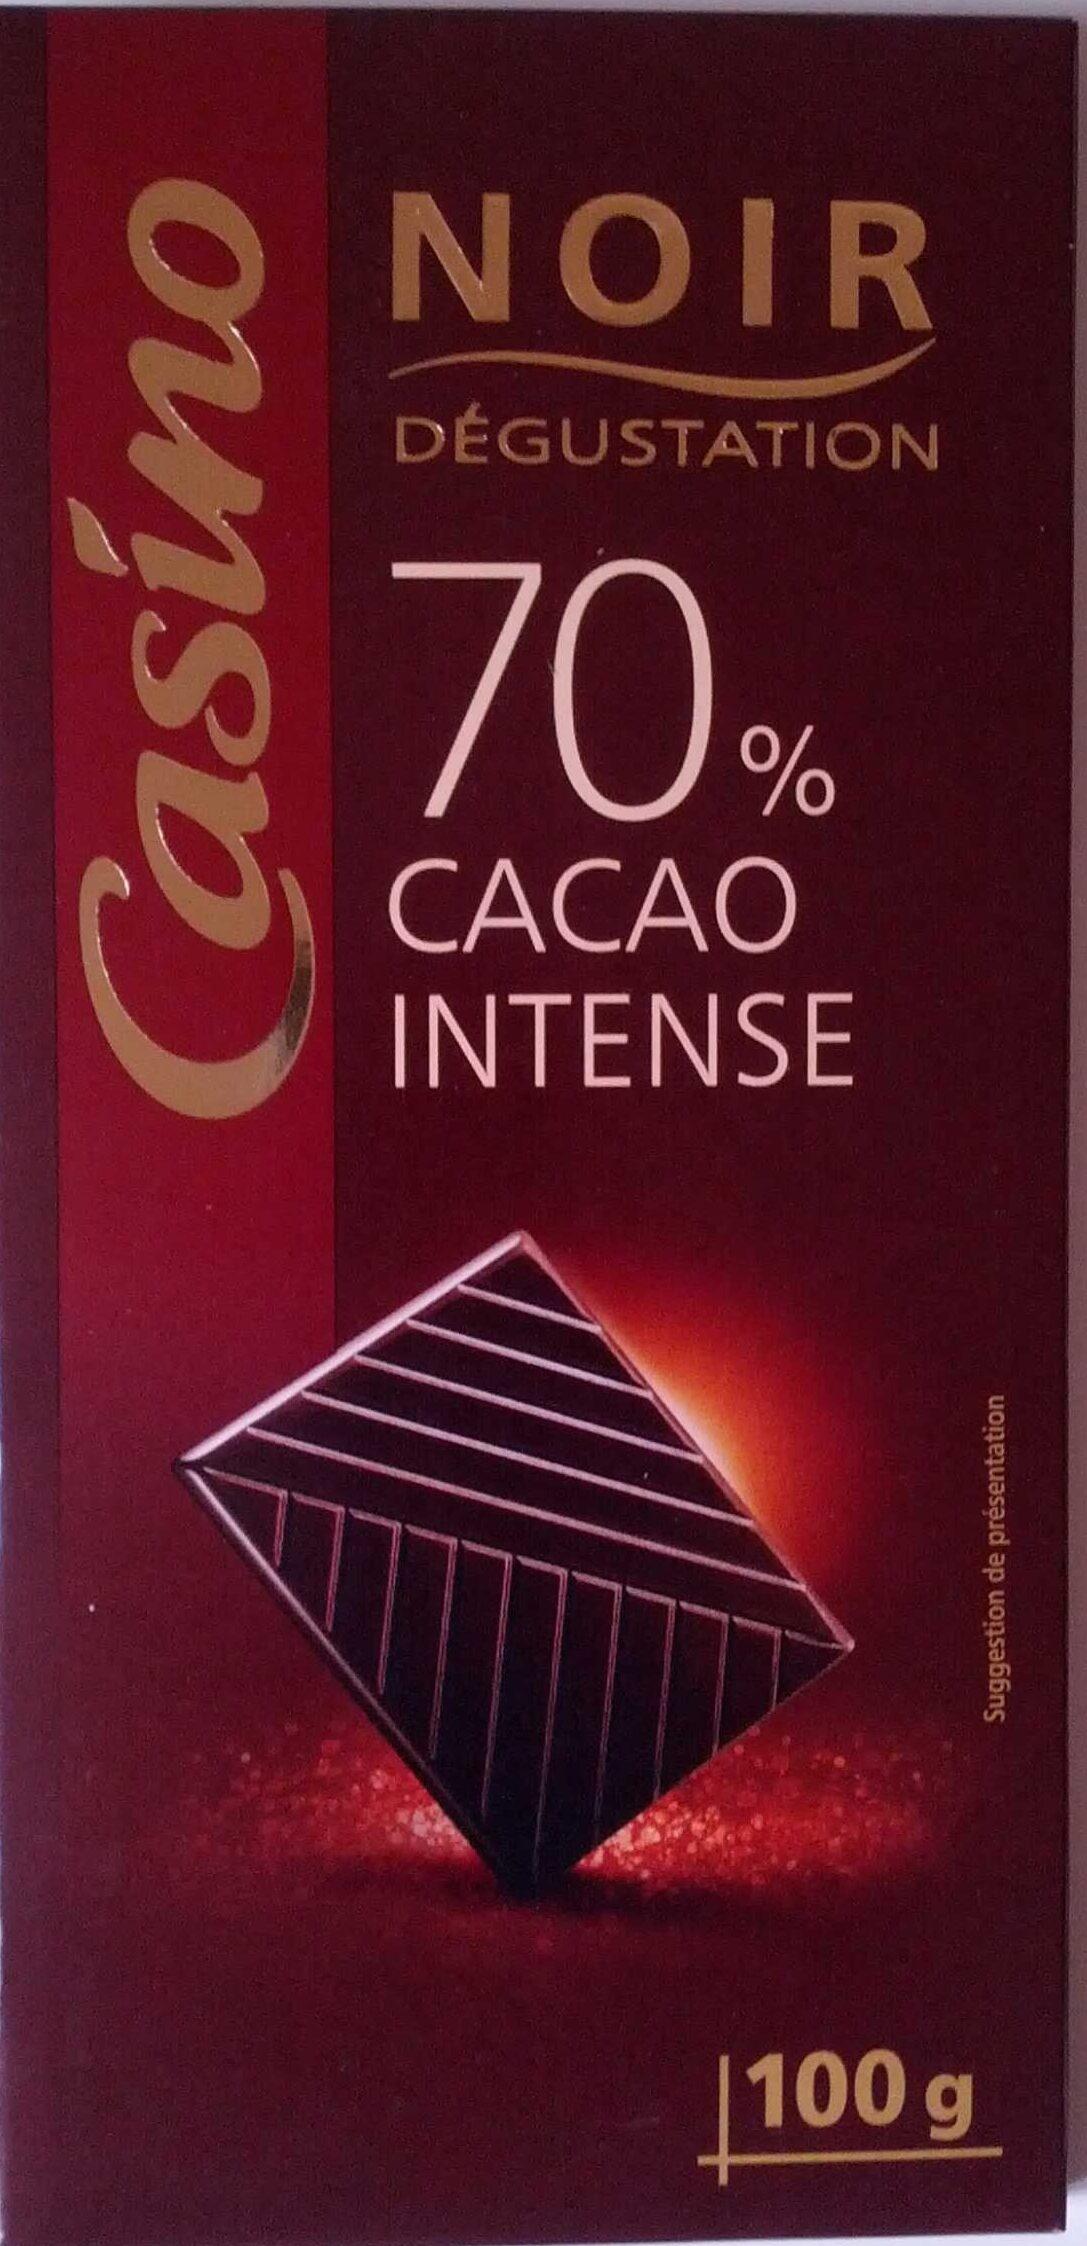 Chocolat Noir Dégustation 70% Cacao intense - Produit - fr